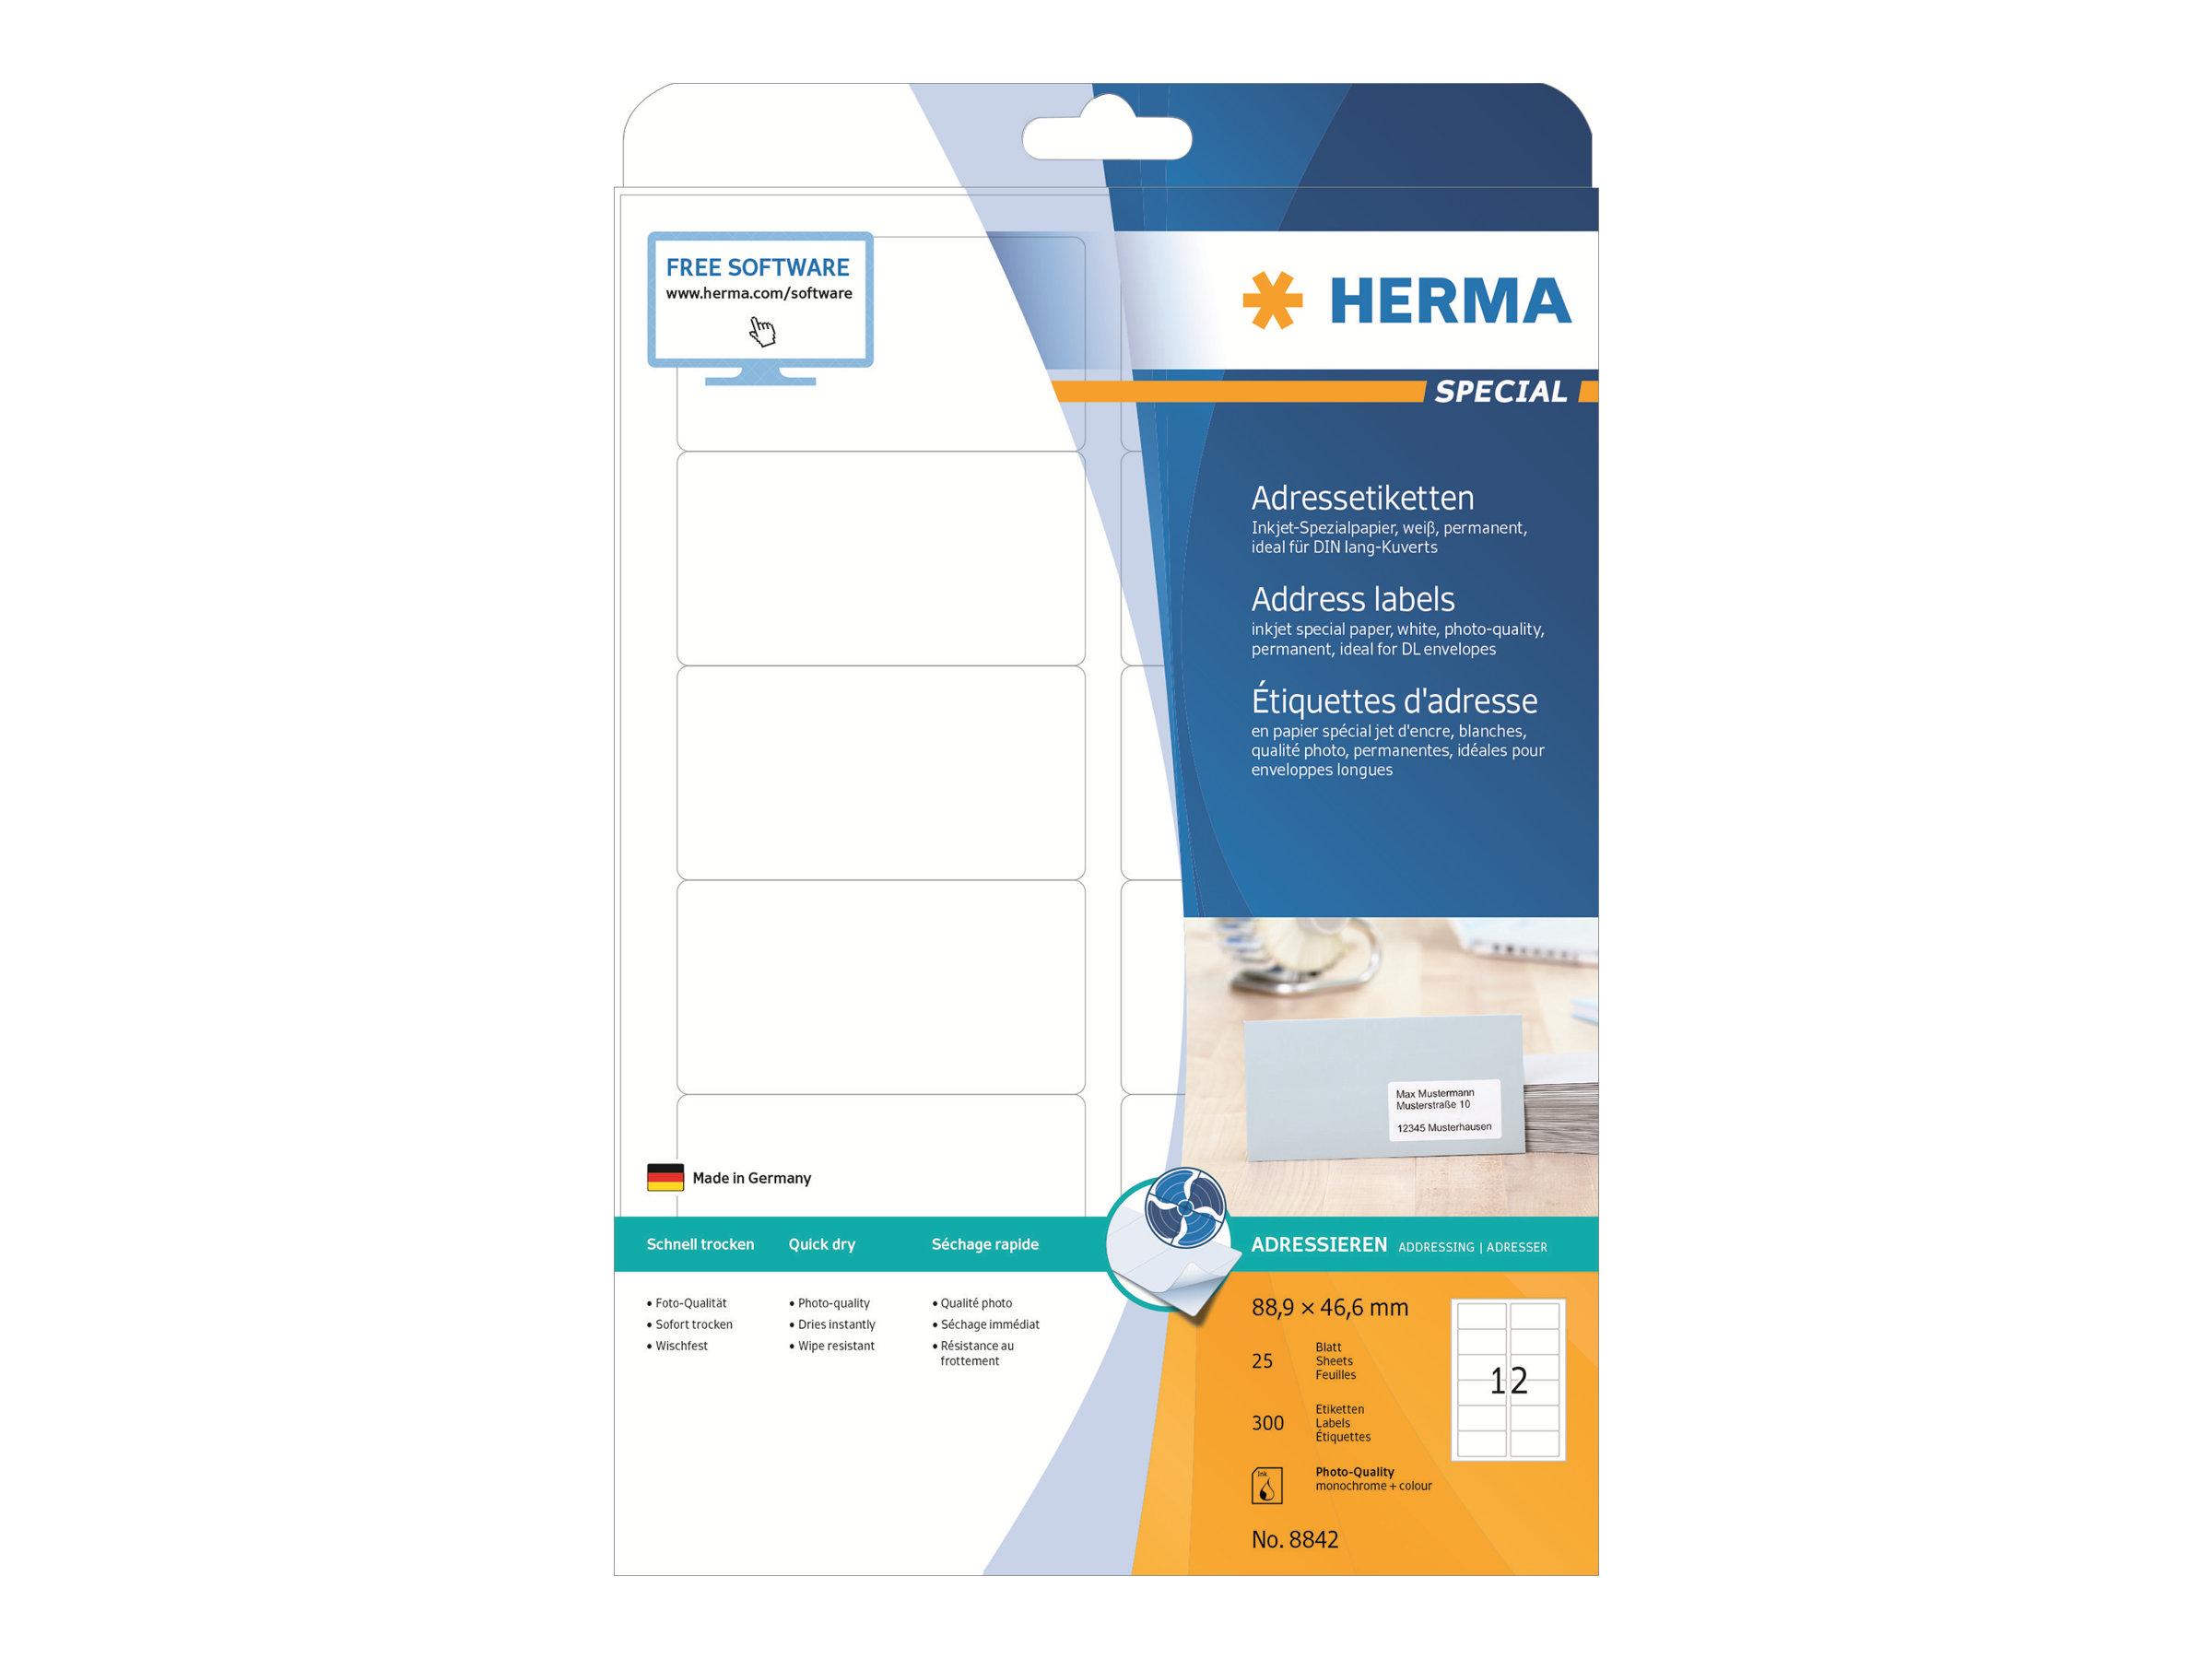 HERMA Special - Papier - matt - permanent selbstklebend - beschichtet - weiß - 88.9 x 46.6 mm - 90 g/m² - 300 Etikett(en) (25 Bogen x 12)